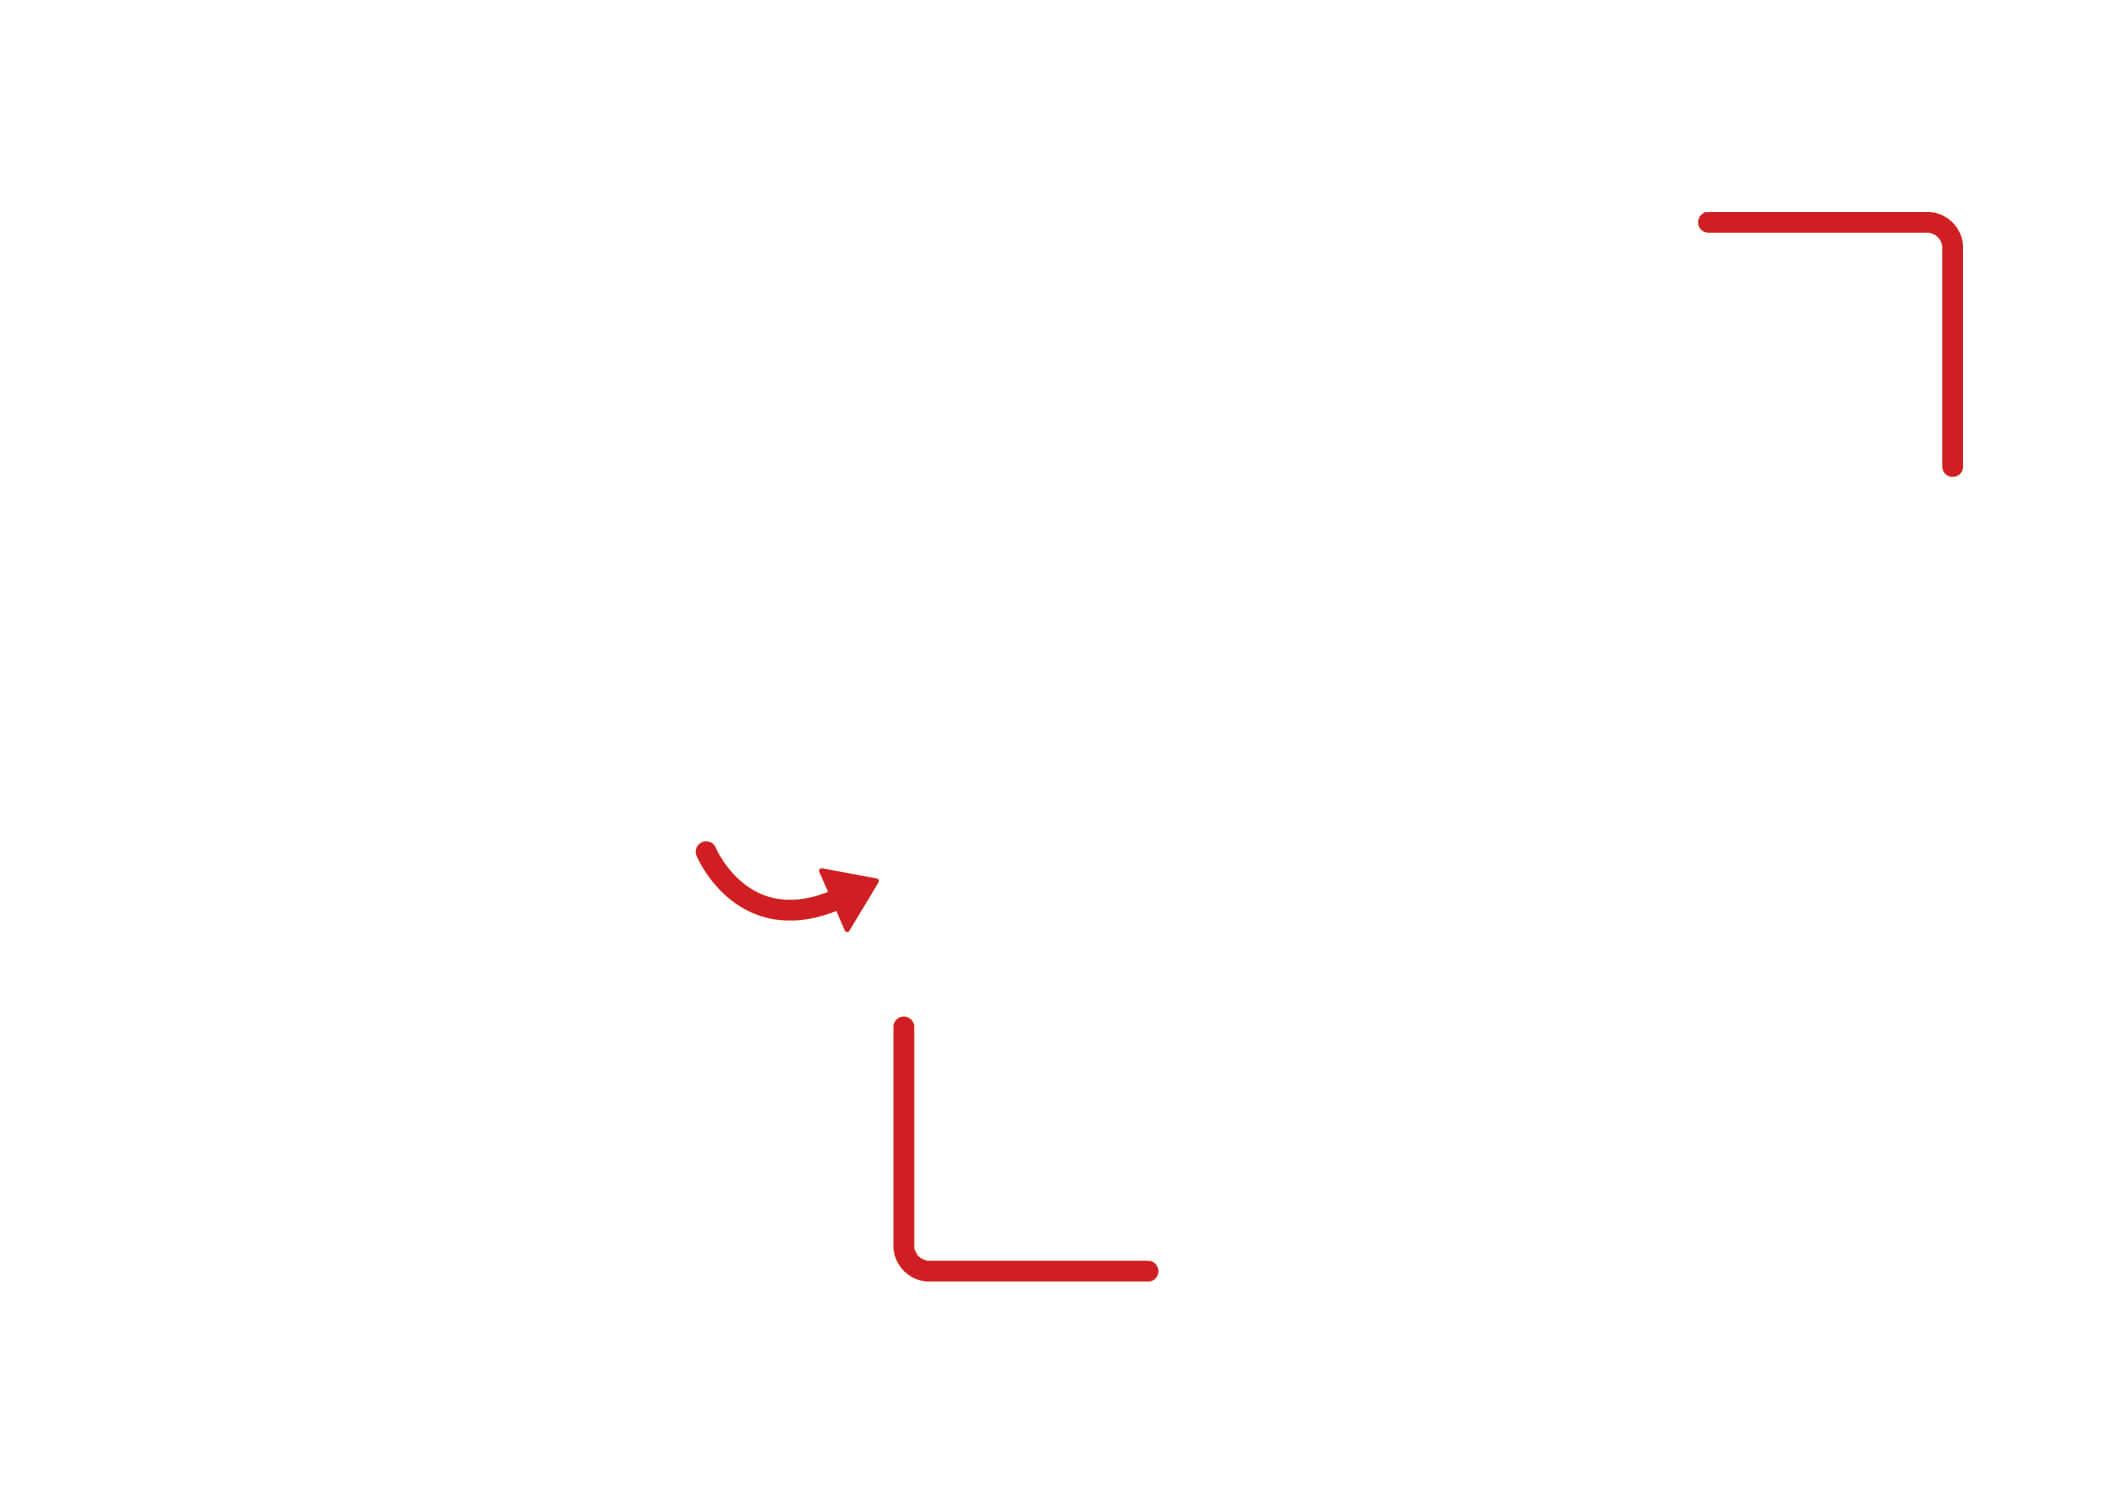 horizontal blank qr code template